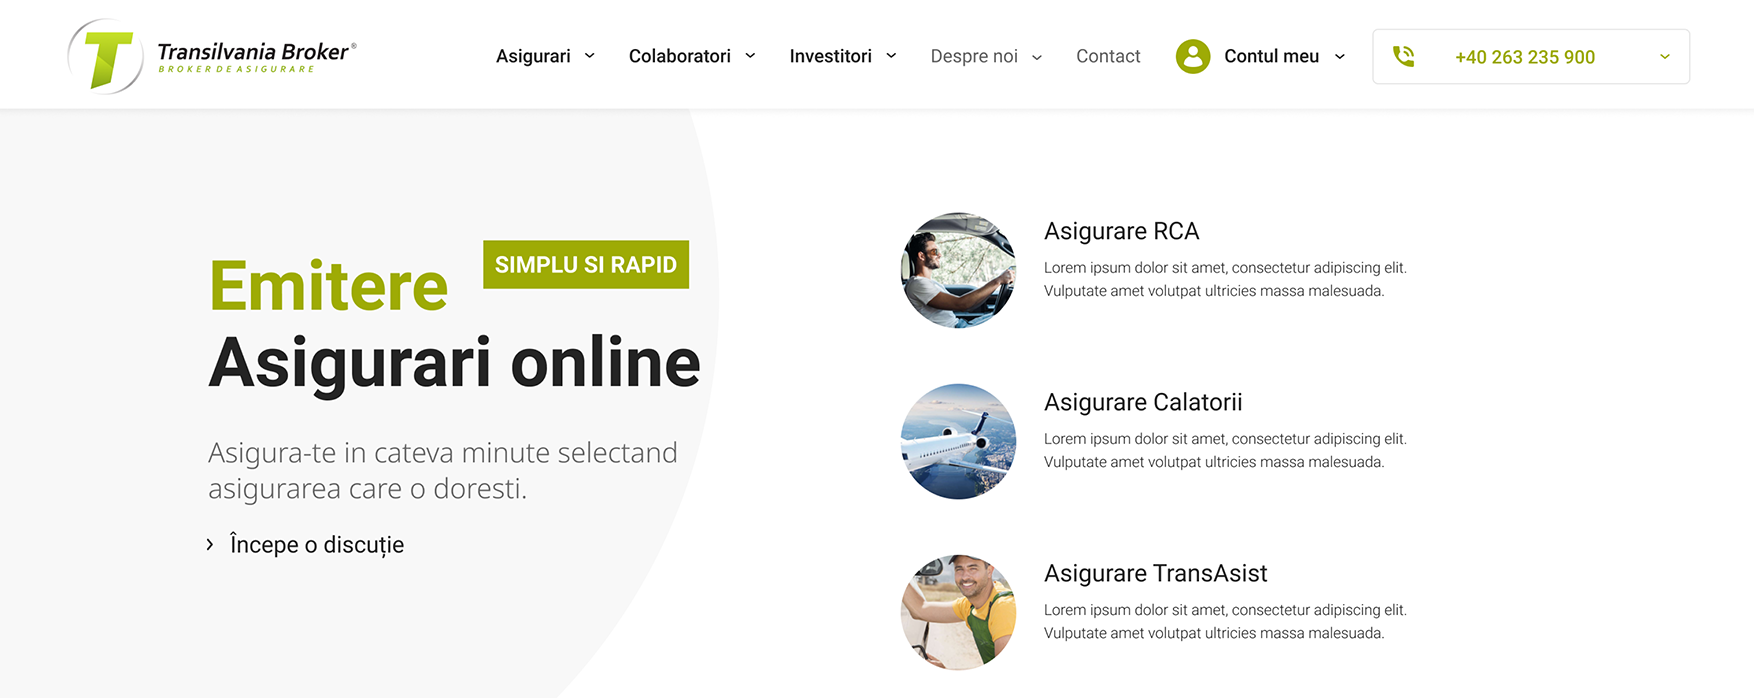 Emitere asigurari online Transilvania Broker